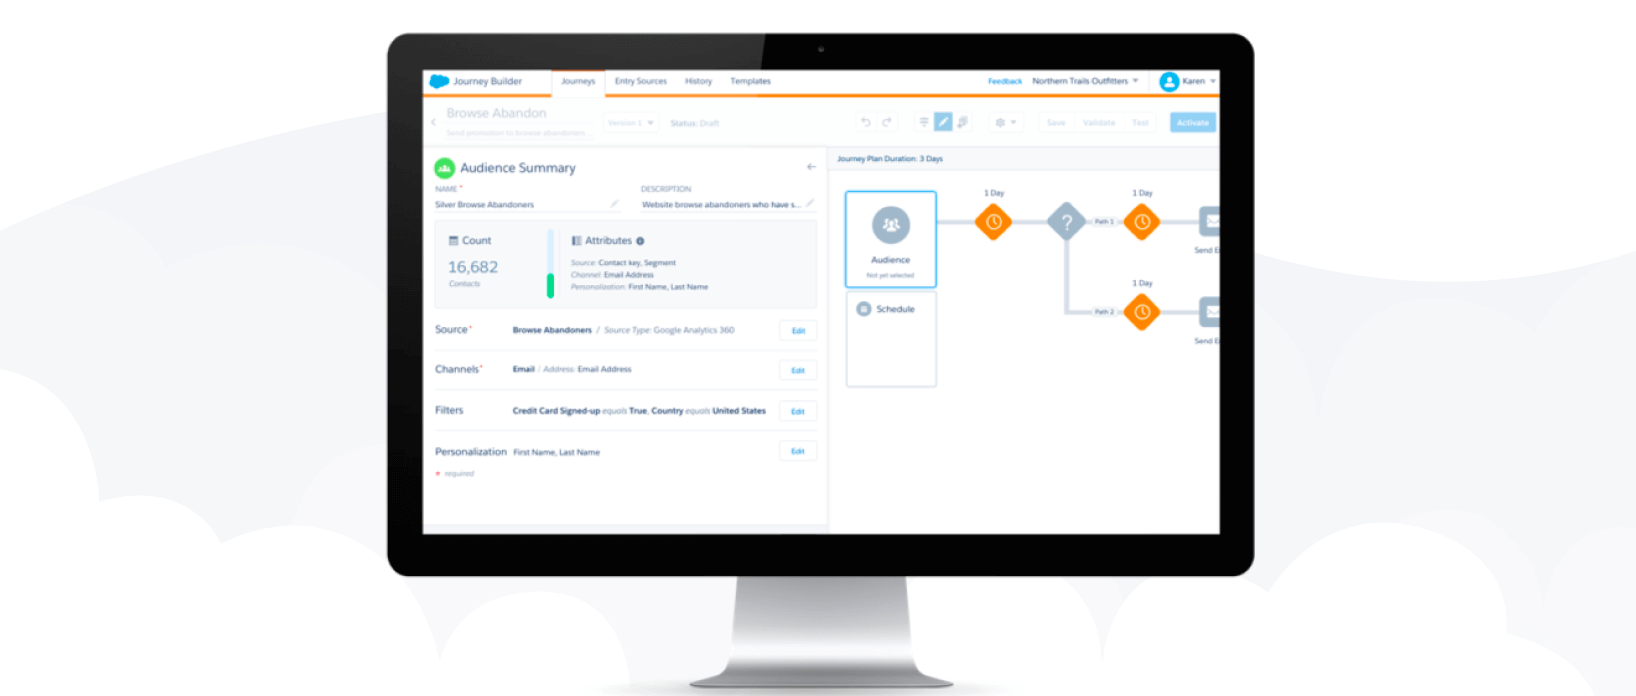 marketing-cloud-actualizacion-journey-builder